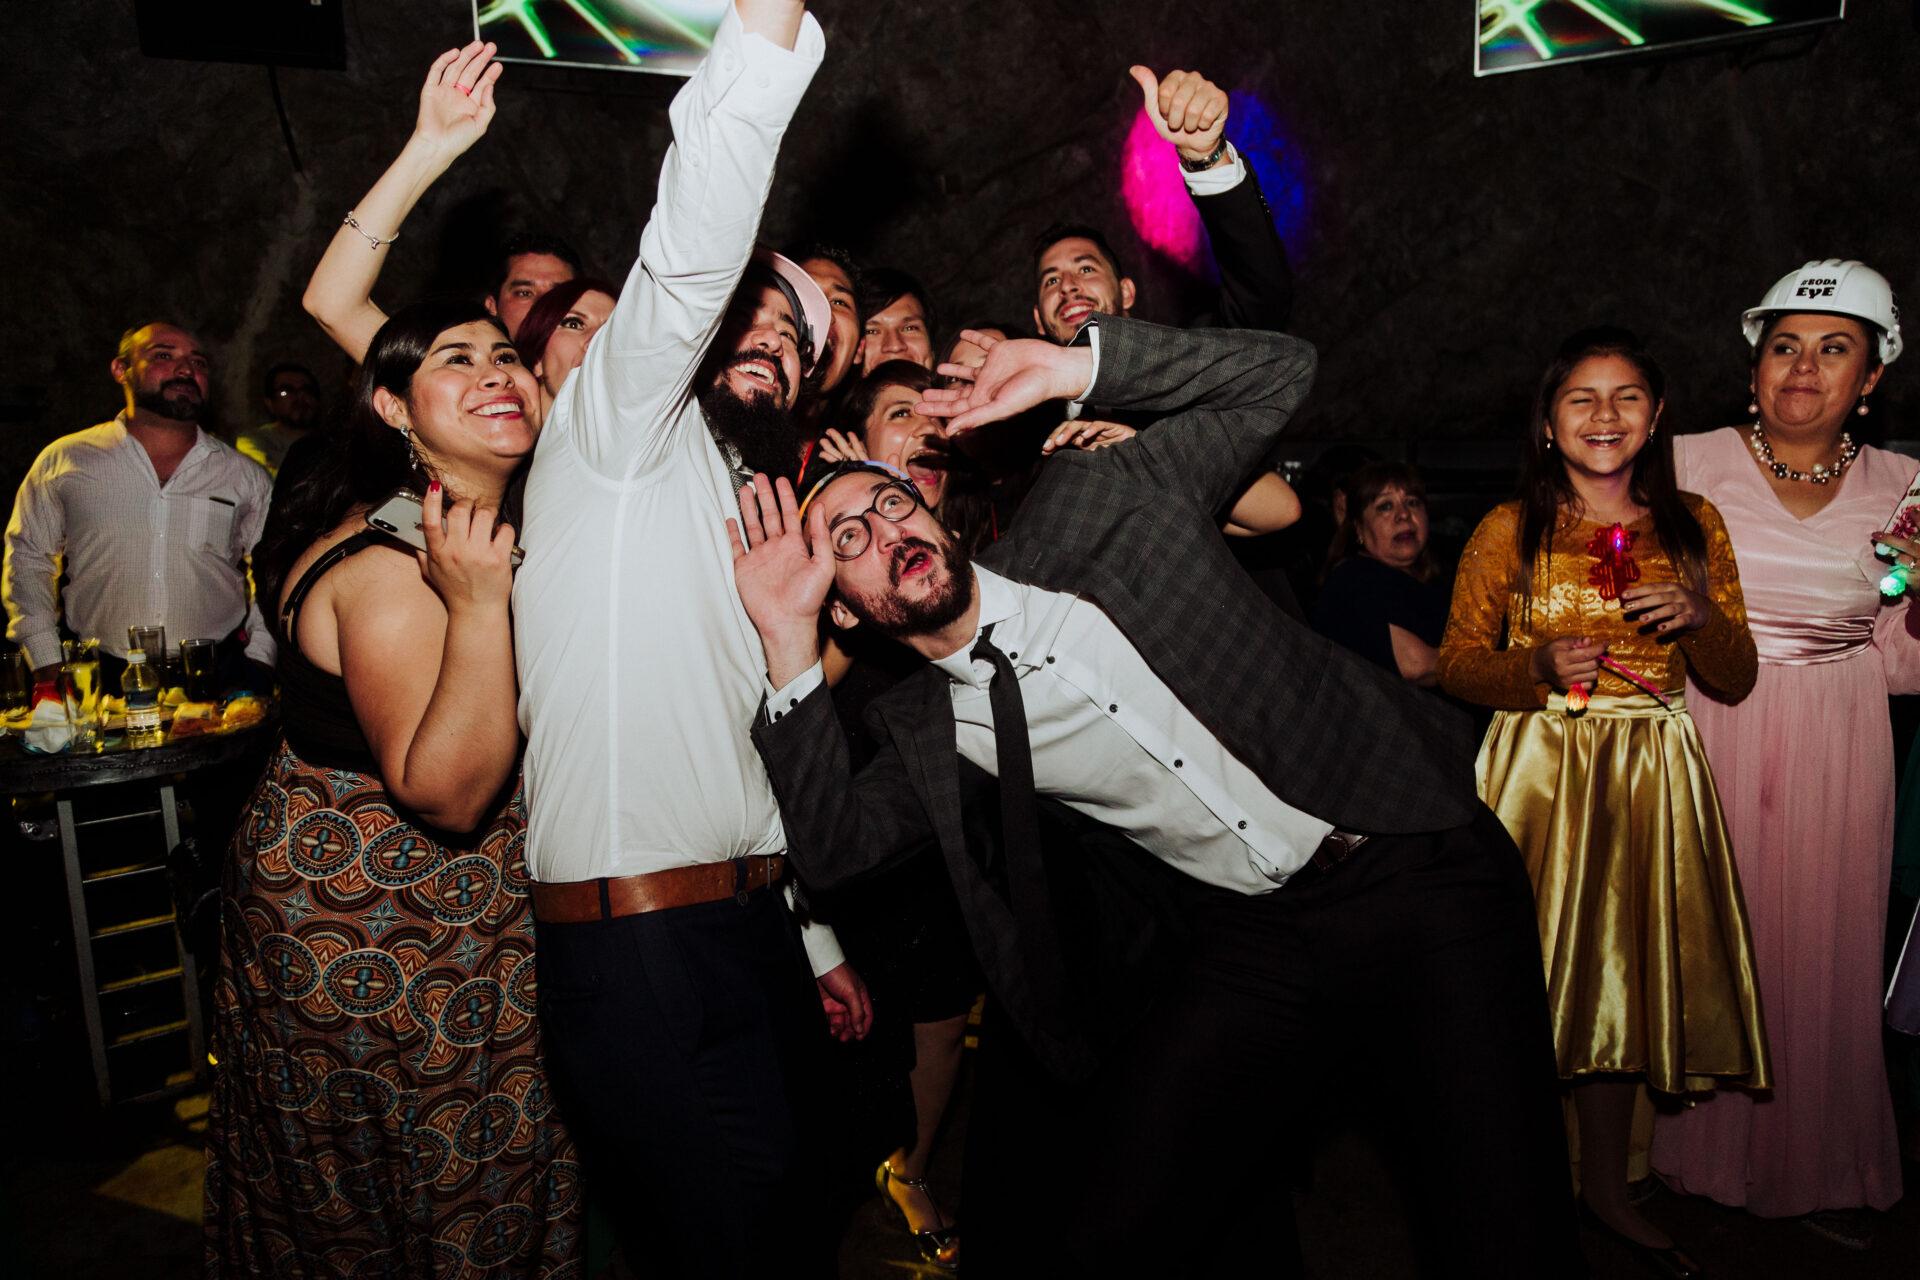 javier_noriega_fotografo_bodas_la_mina_club_zacatecas_wedding_photographer35